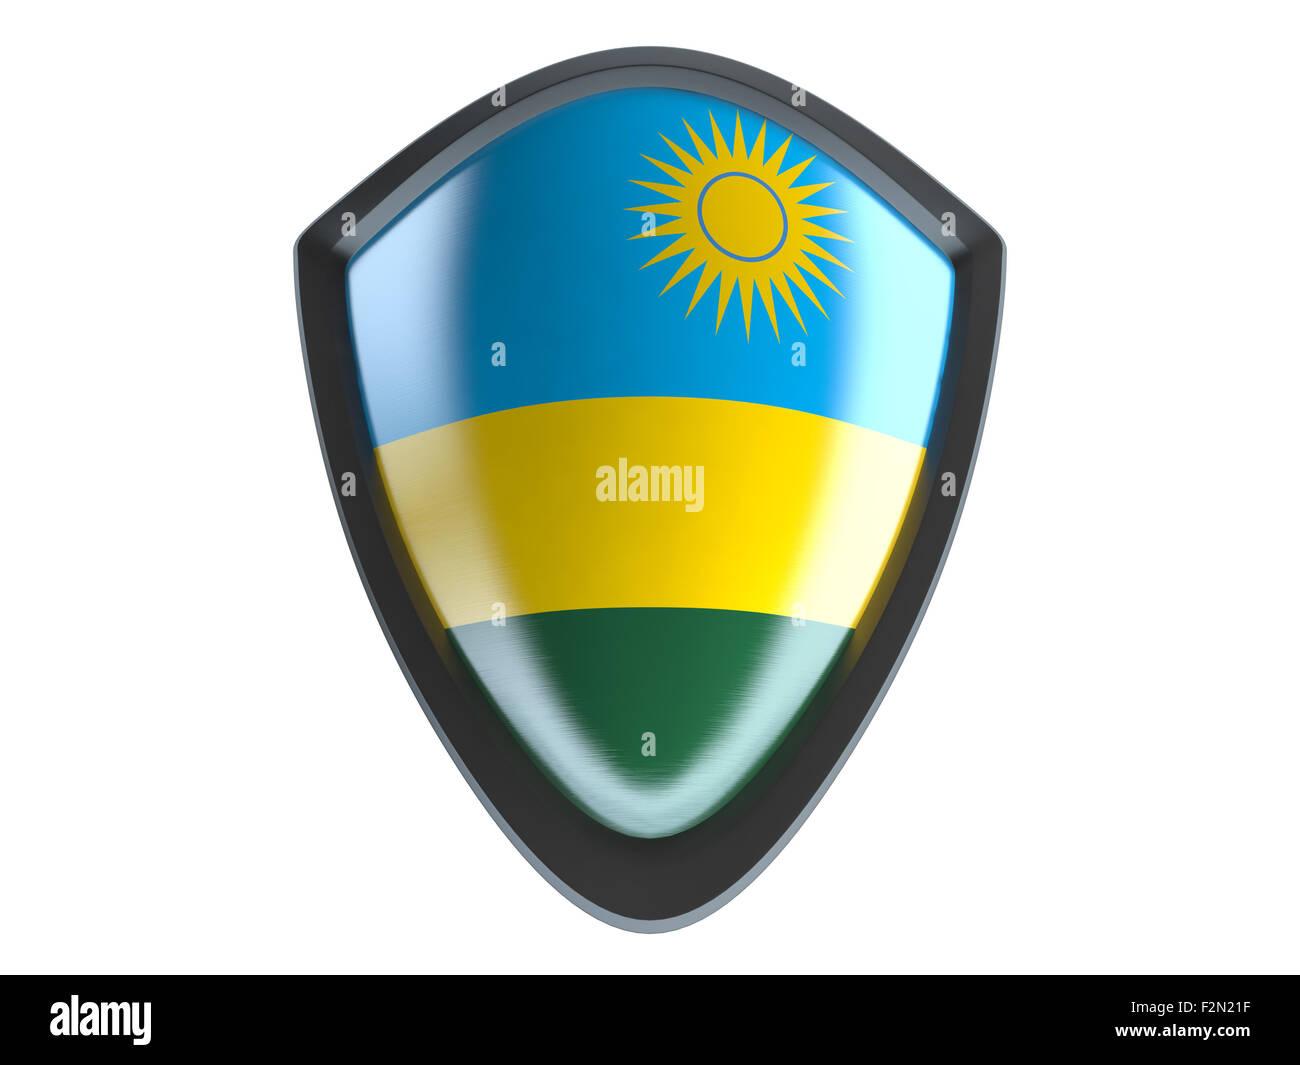 Rwanda flag on metal shield isolate on white background. - Stock Image